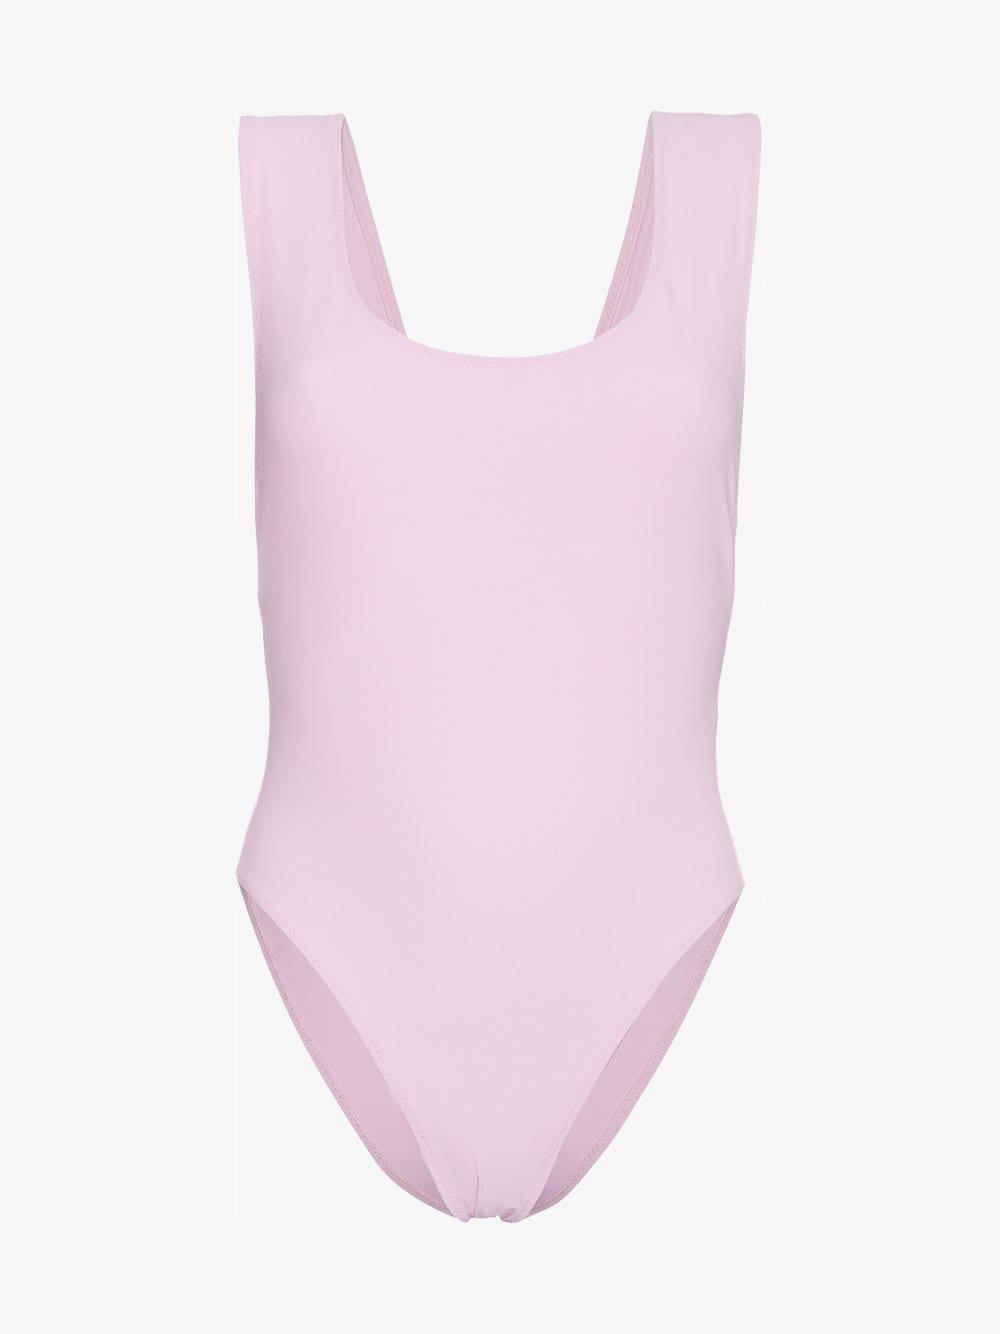 440bbc492b1ce5 Lyst - Araks Pink Jireh Cutout Swimsuit in Pink - Save 17%